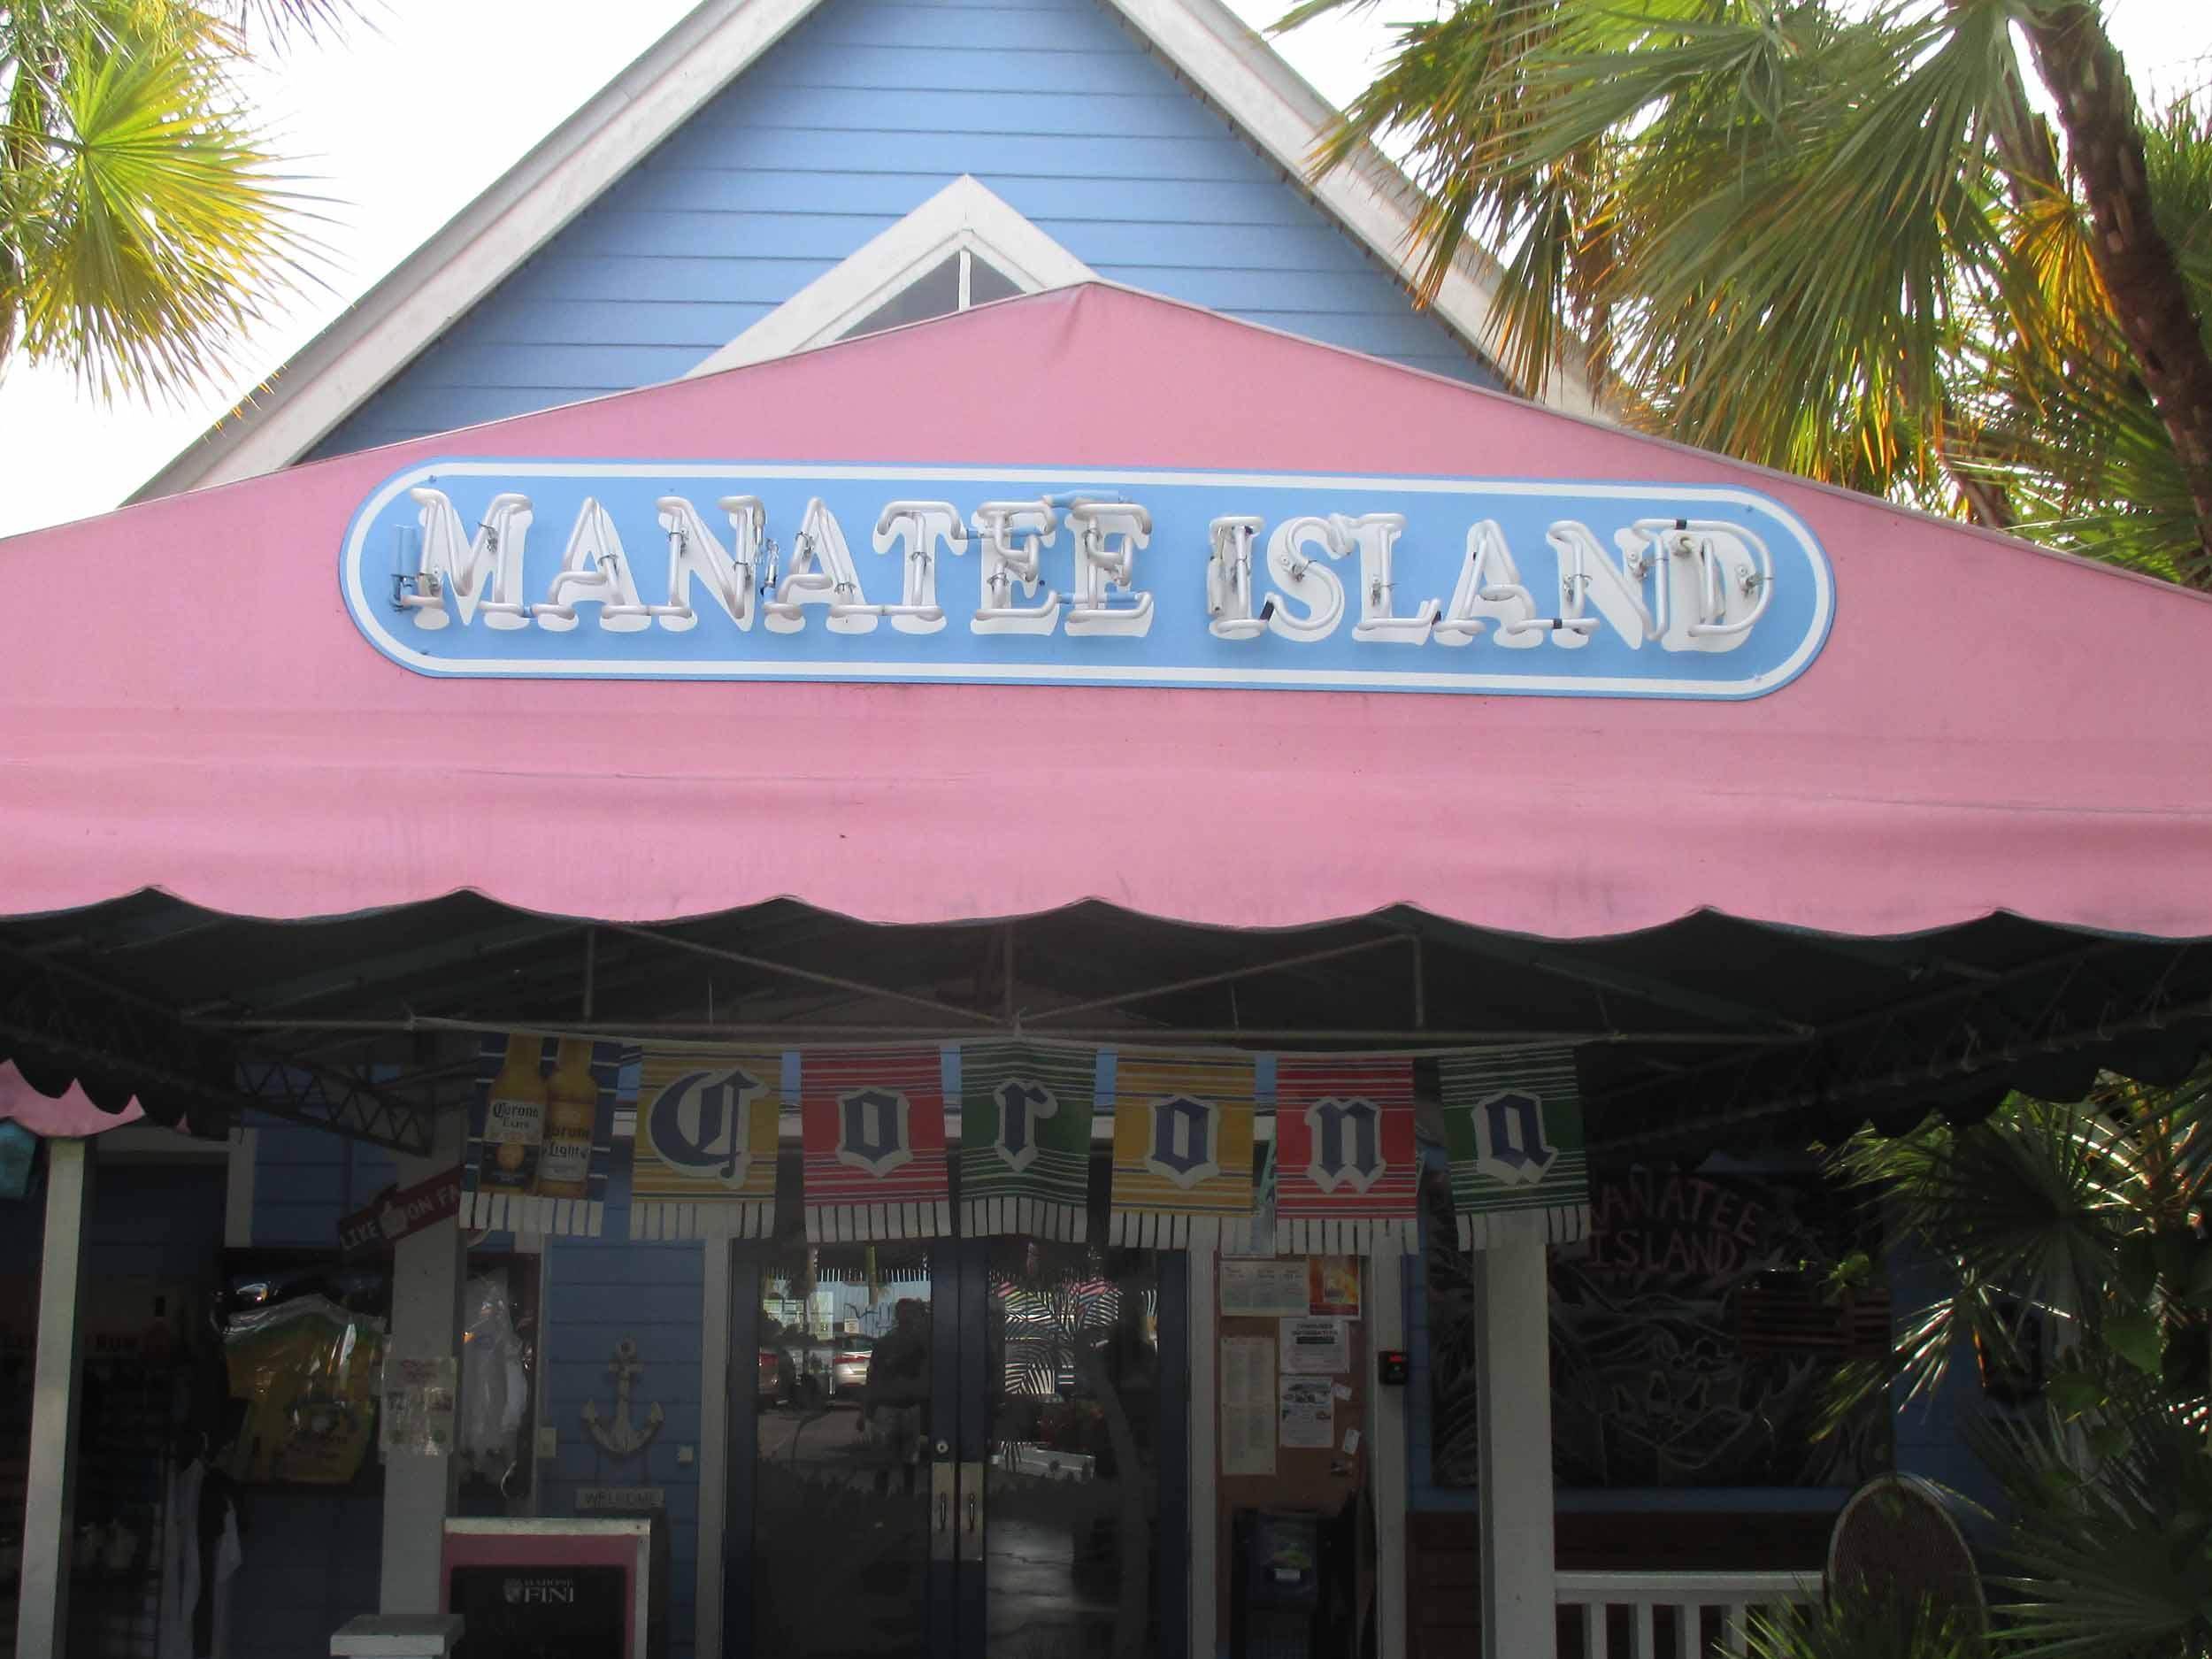 Manatee Island Bar and Grill Entrance